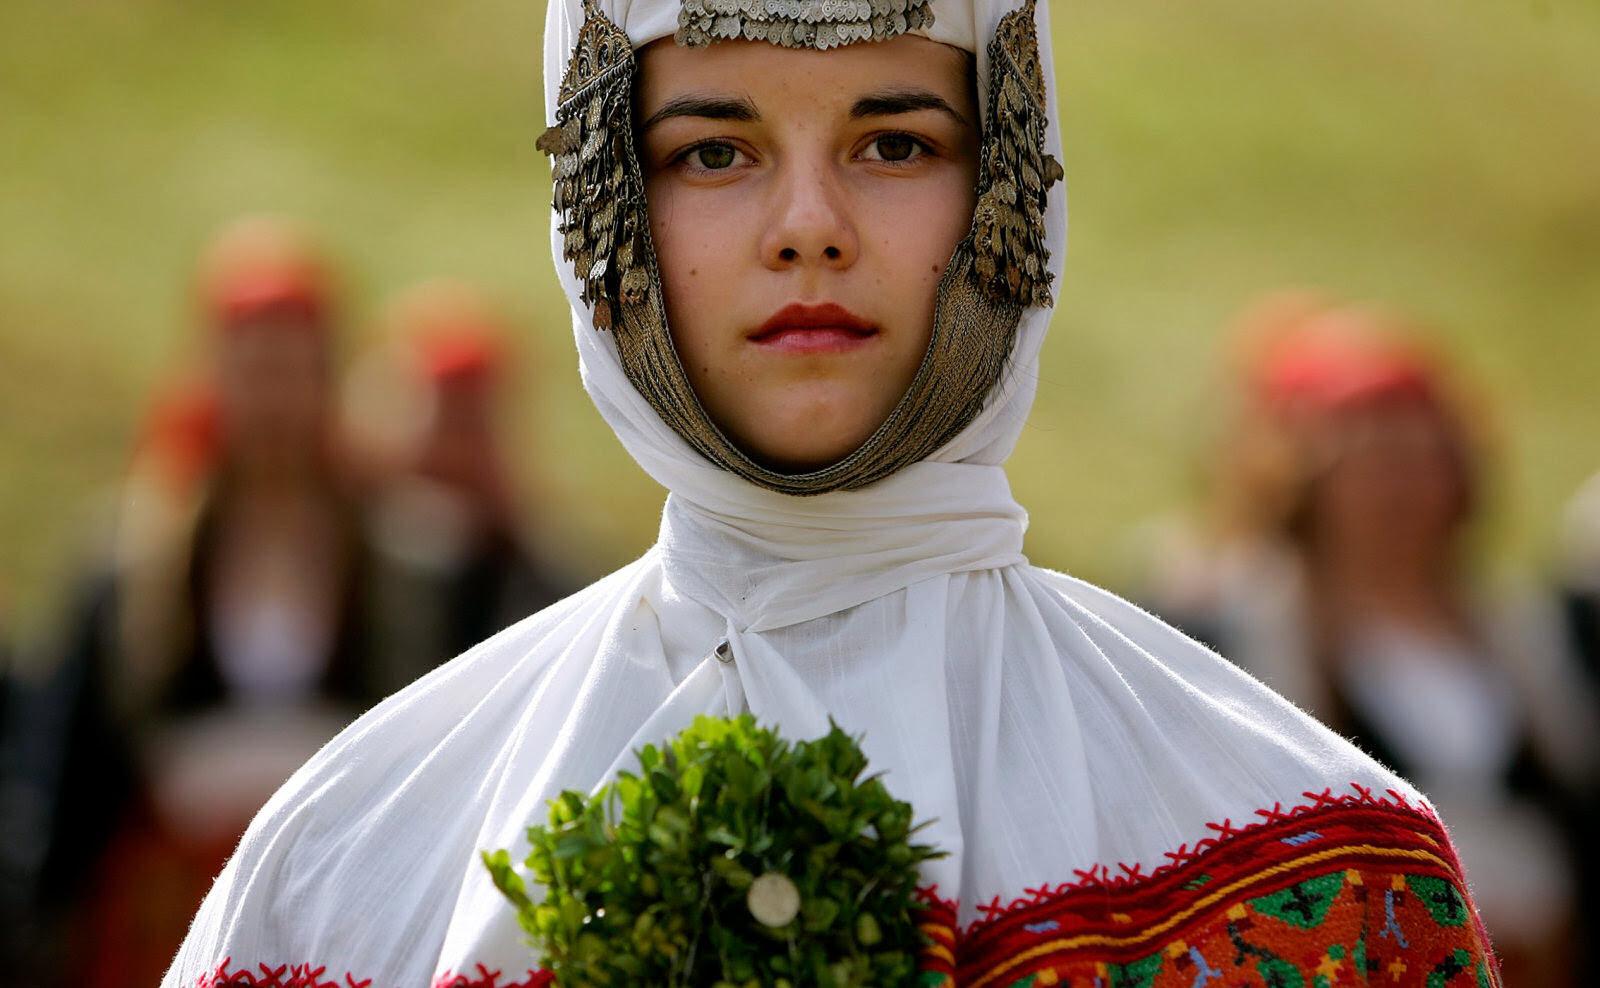 27 belas fotos de vestidos tradicionais de casamentos por todo o mundo 01